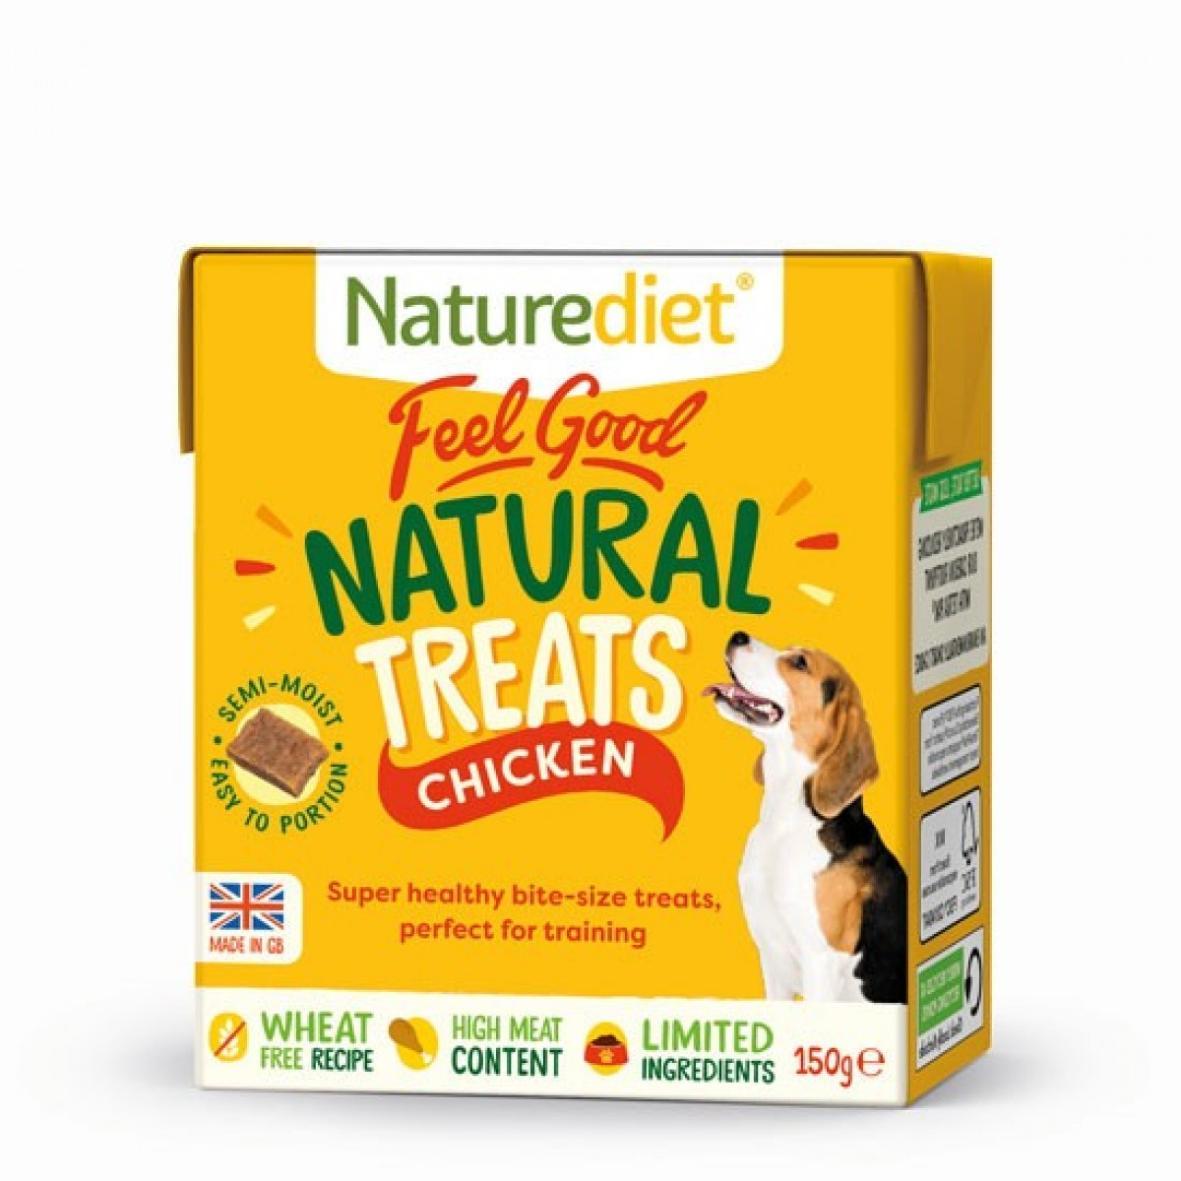 Naturediet Feel Good Natural Treats Chicken 150gm